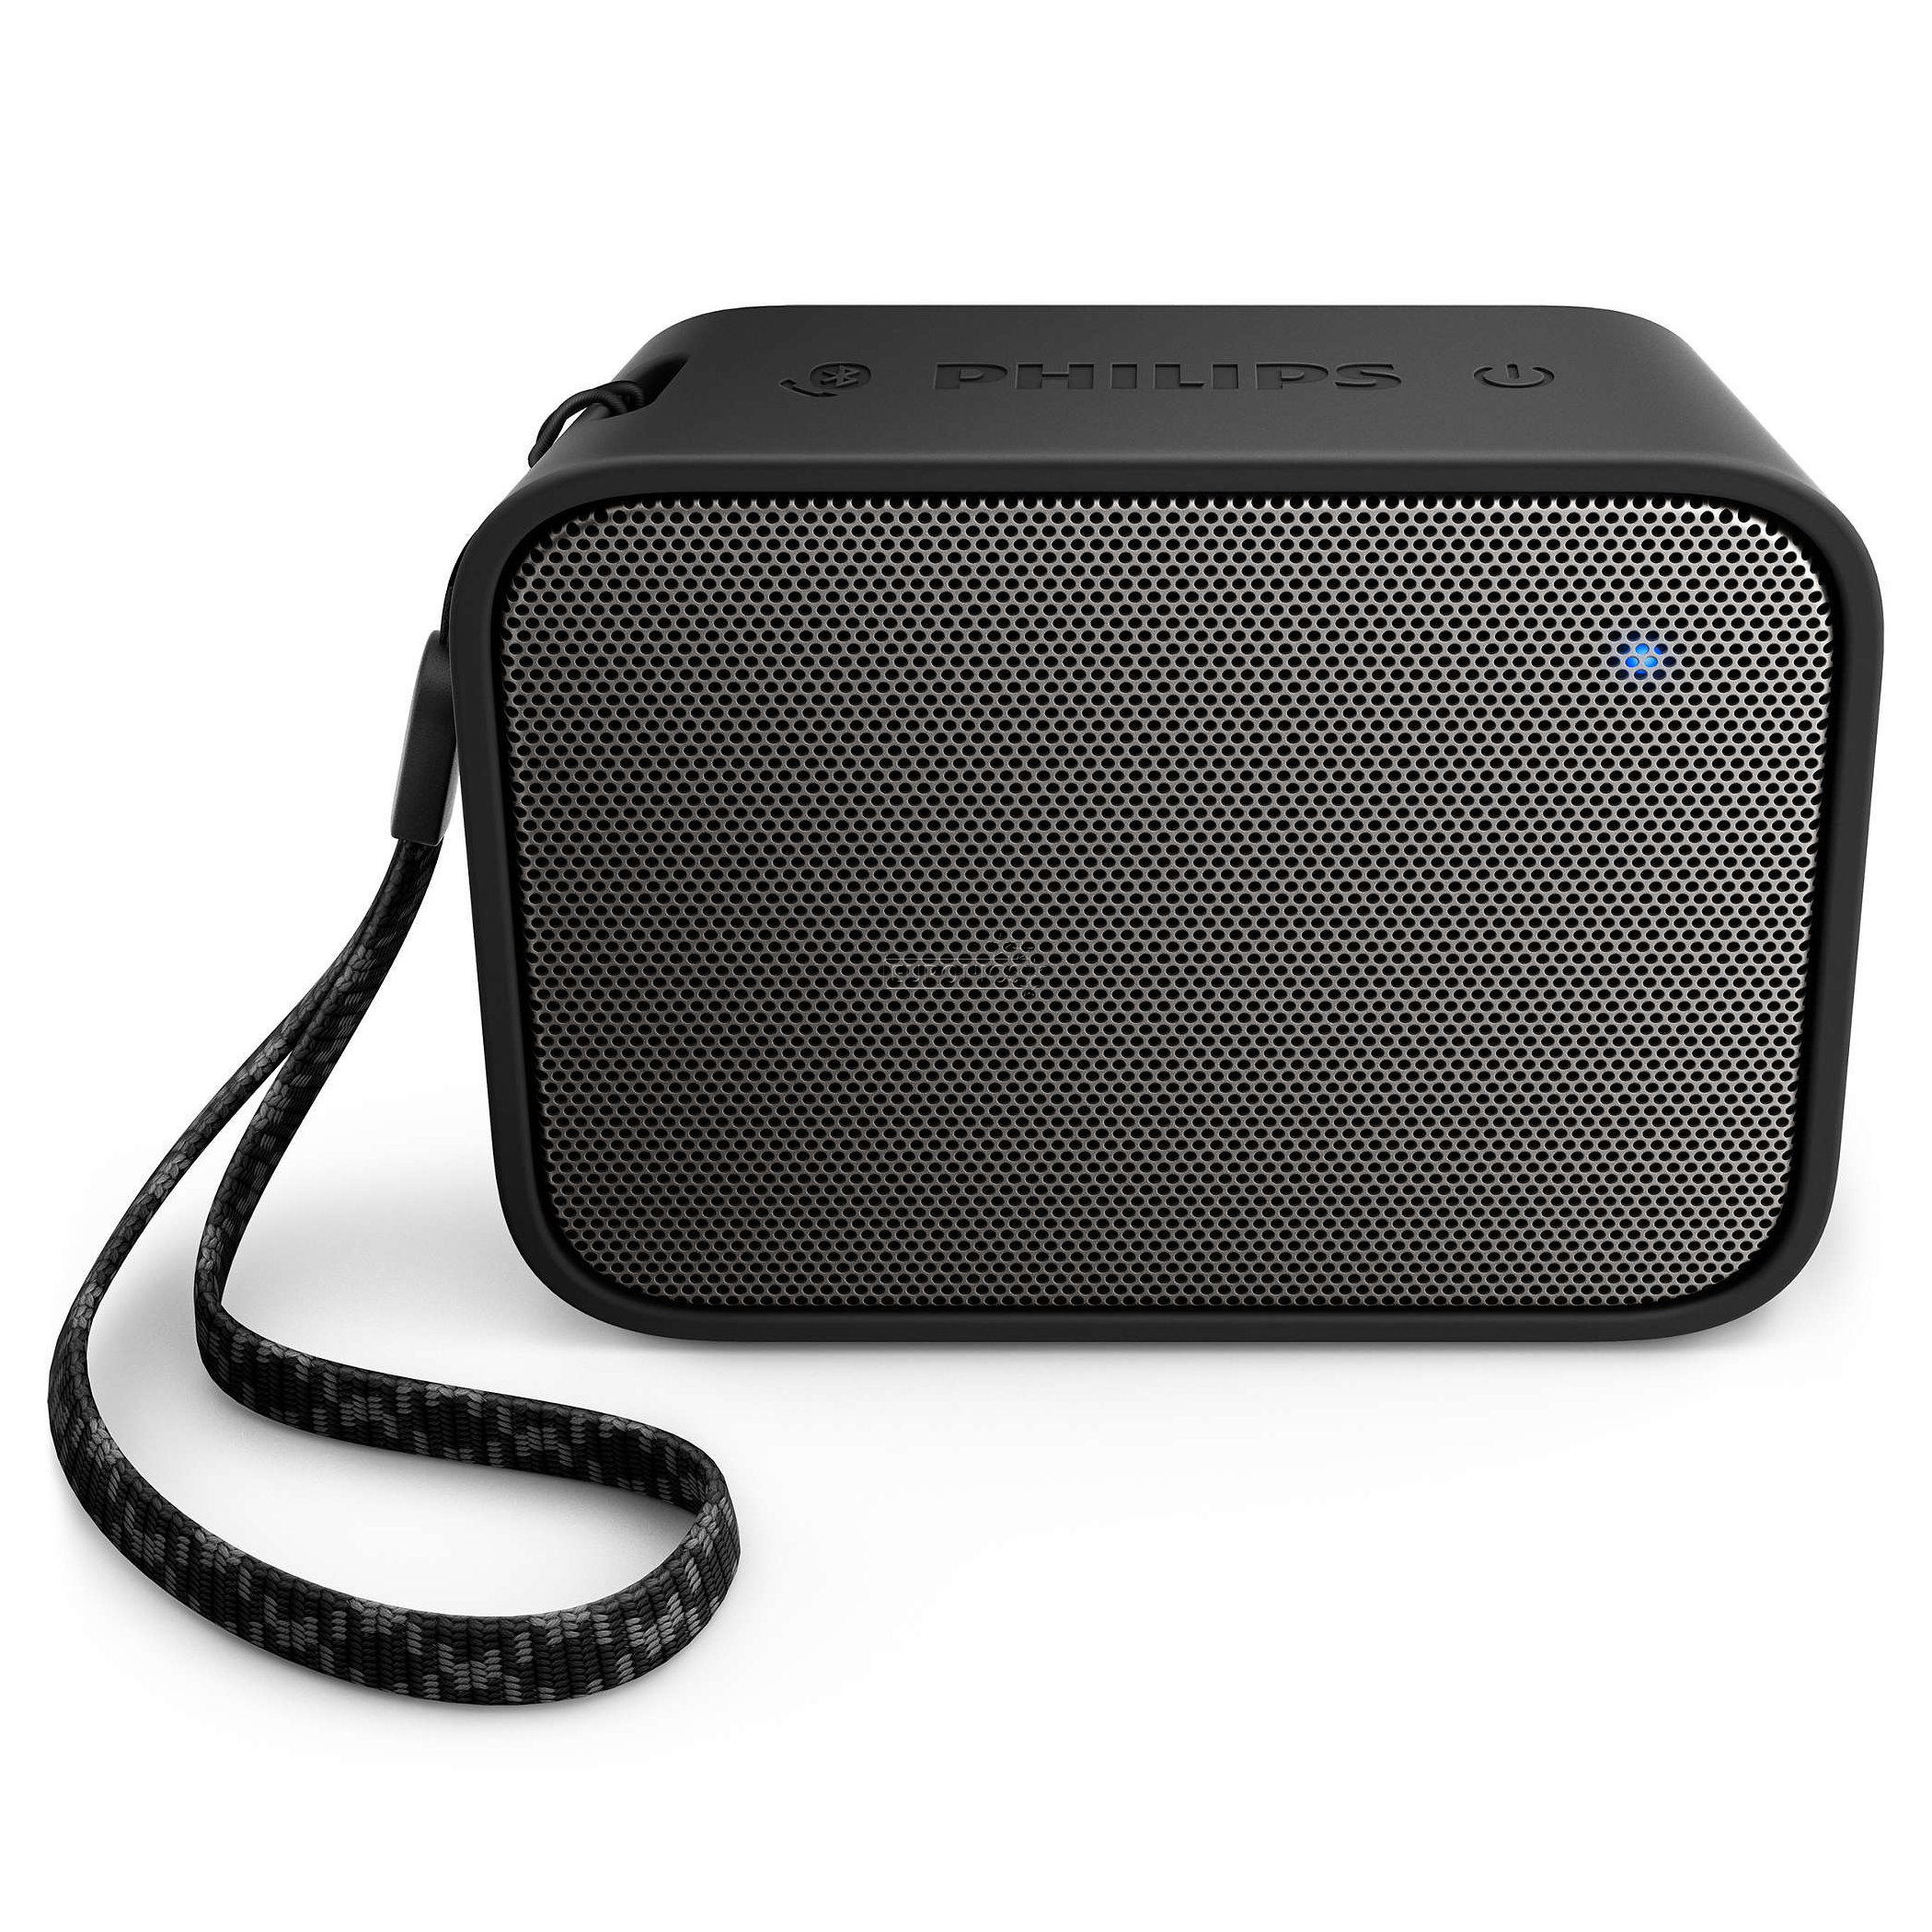 Portable wireless speaker philips bt110 bt110b 00 for Porta wireless